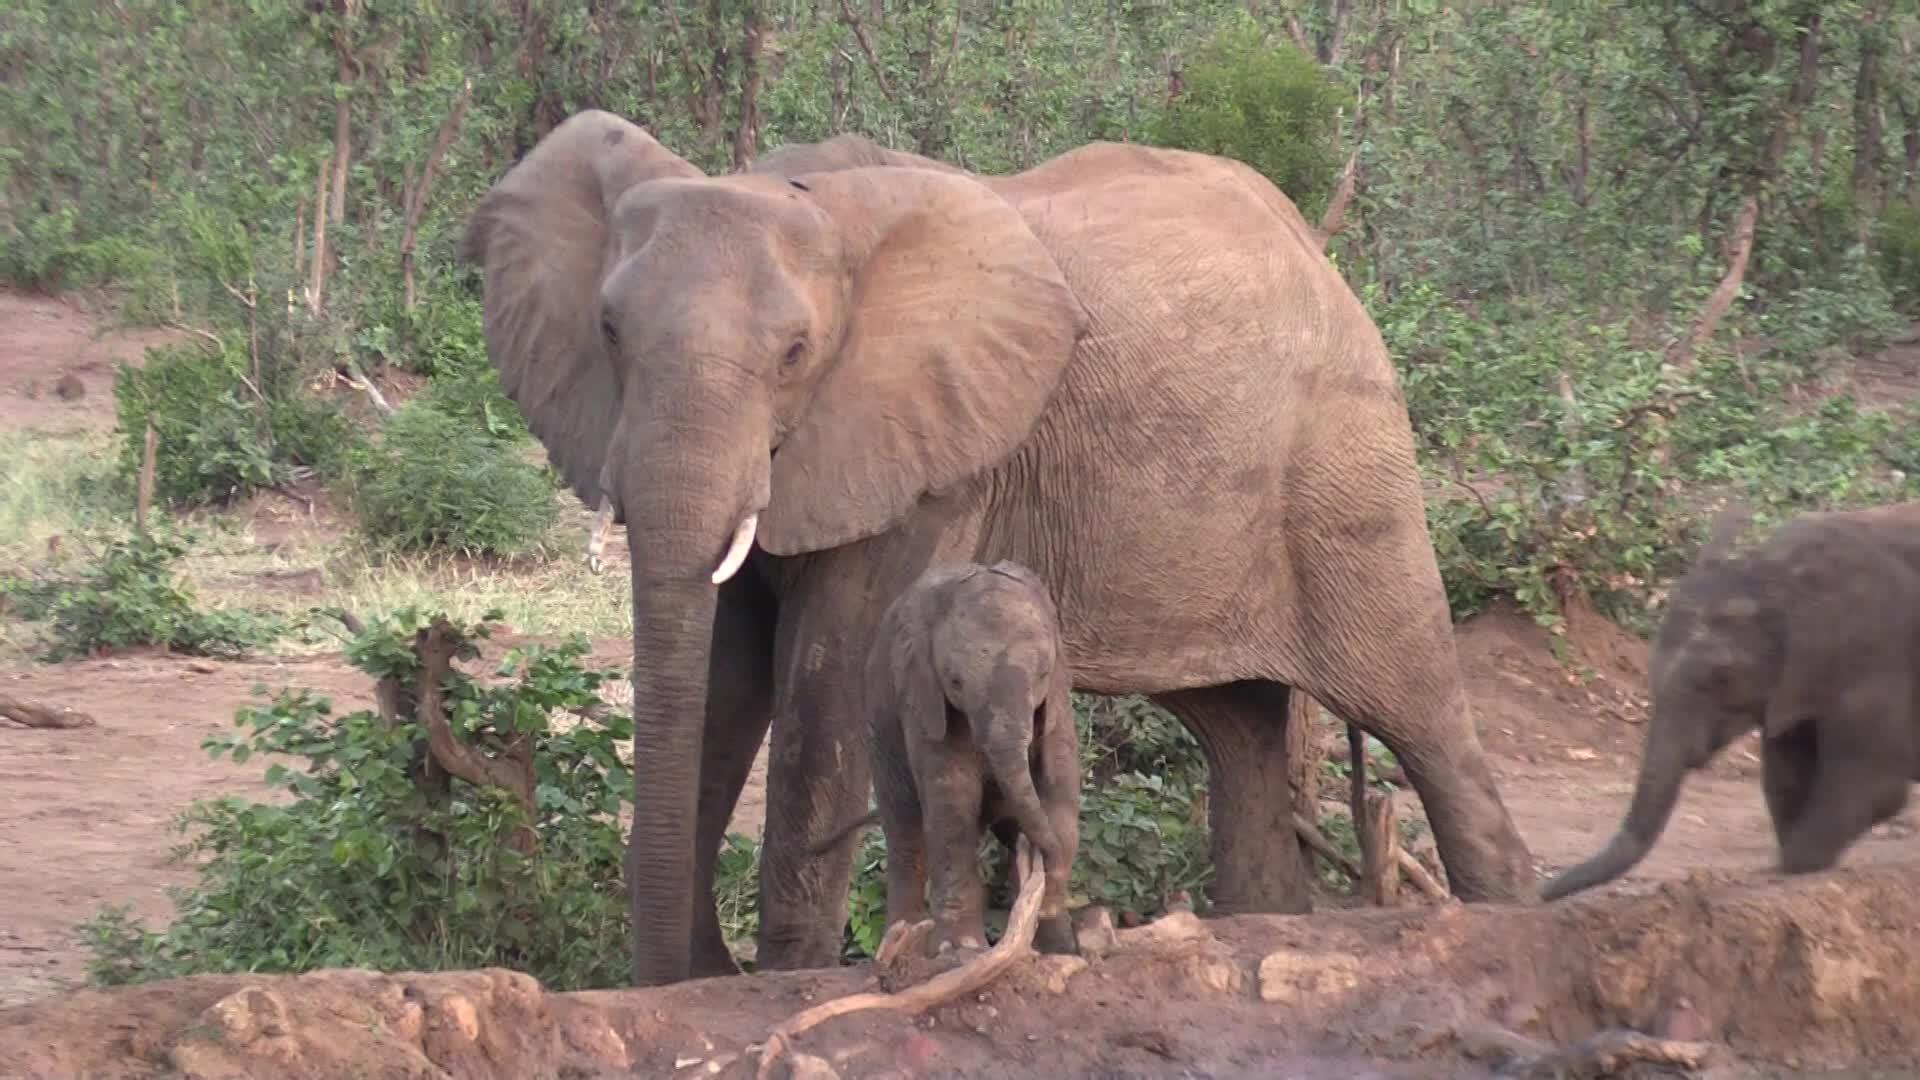 Elephant behaviour., Tony Donnelly, Travel & Events, 00326 GIFs